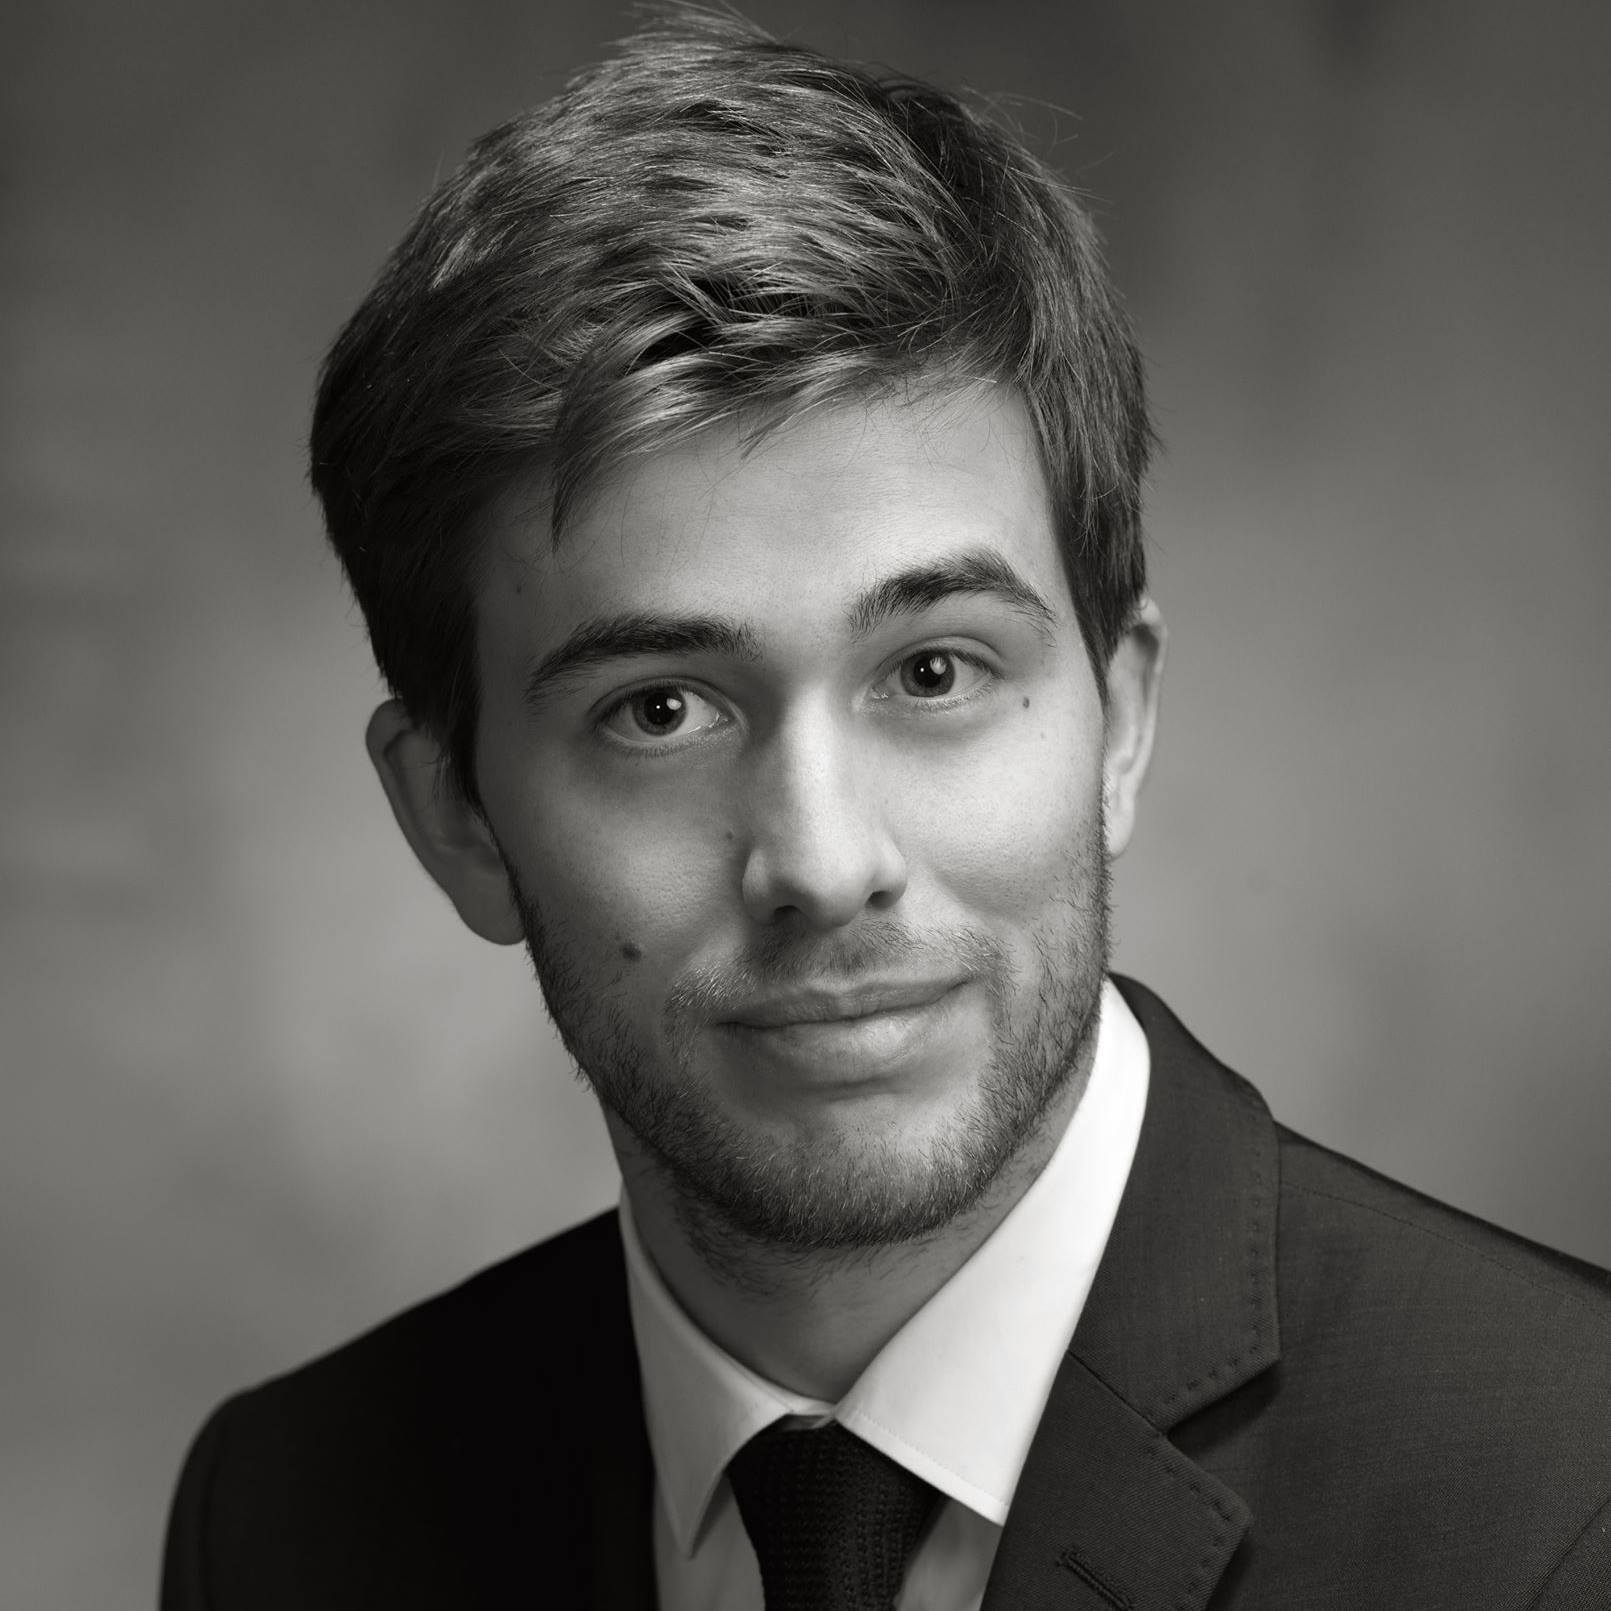 Guillaume Allègre